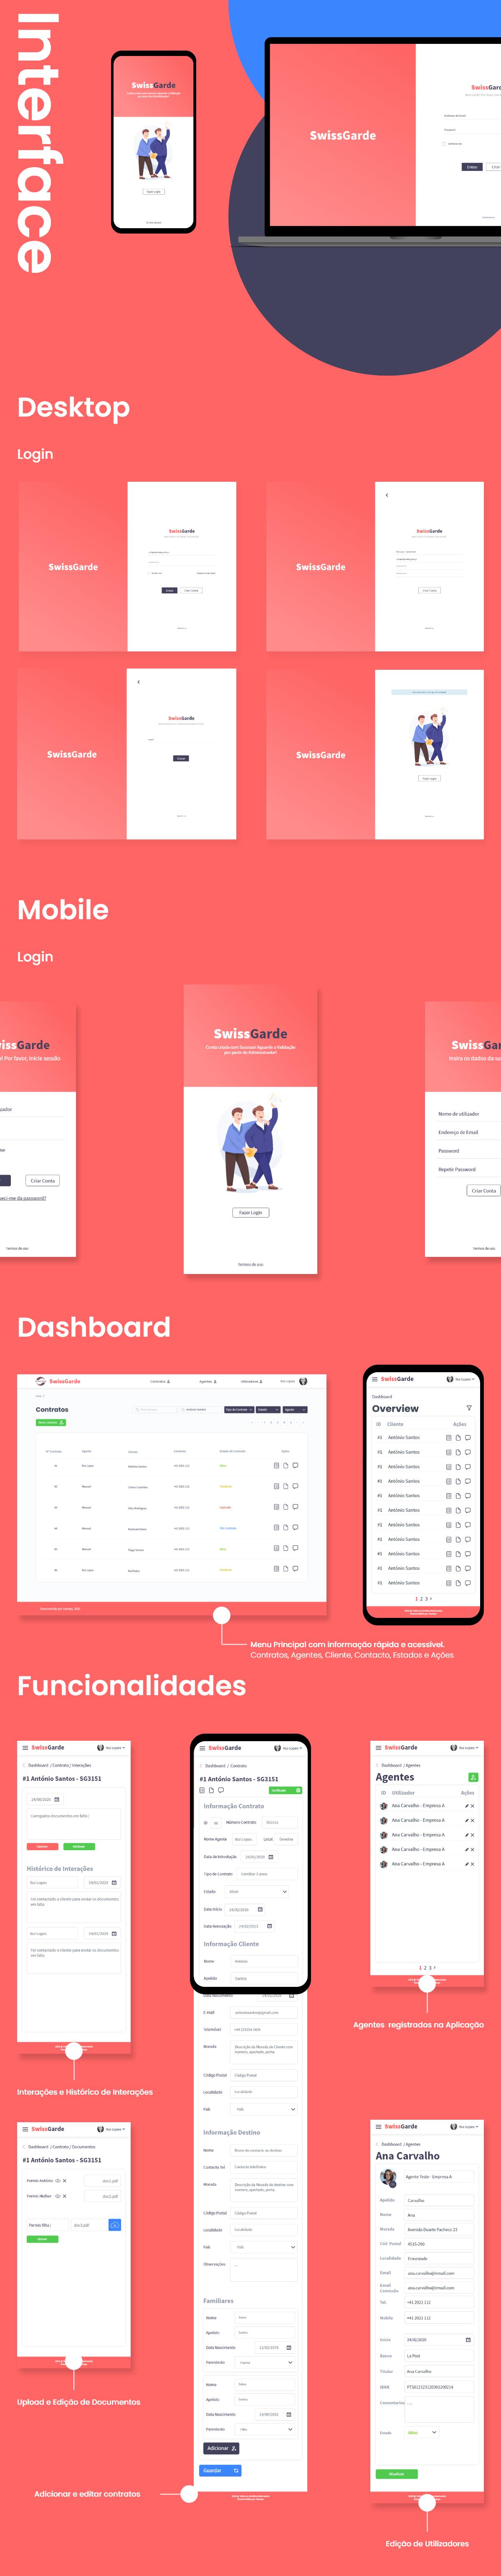 Design System – Interface